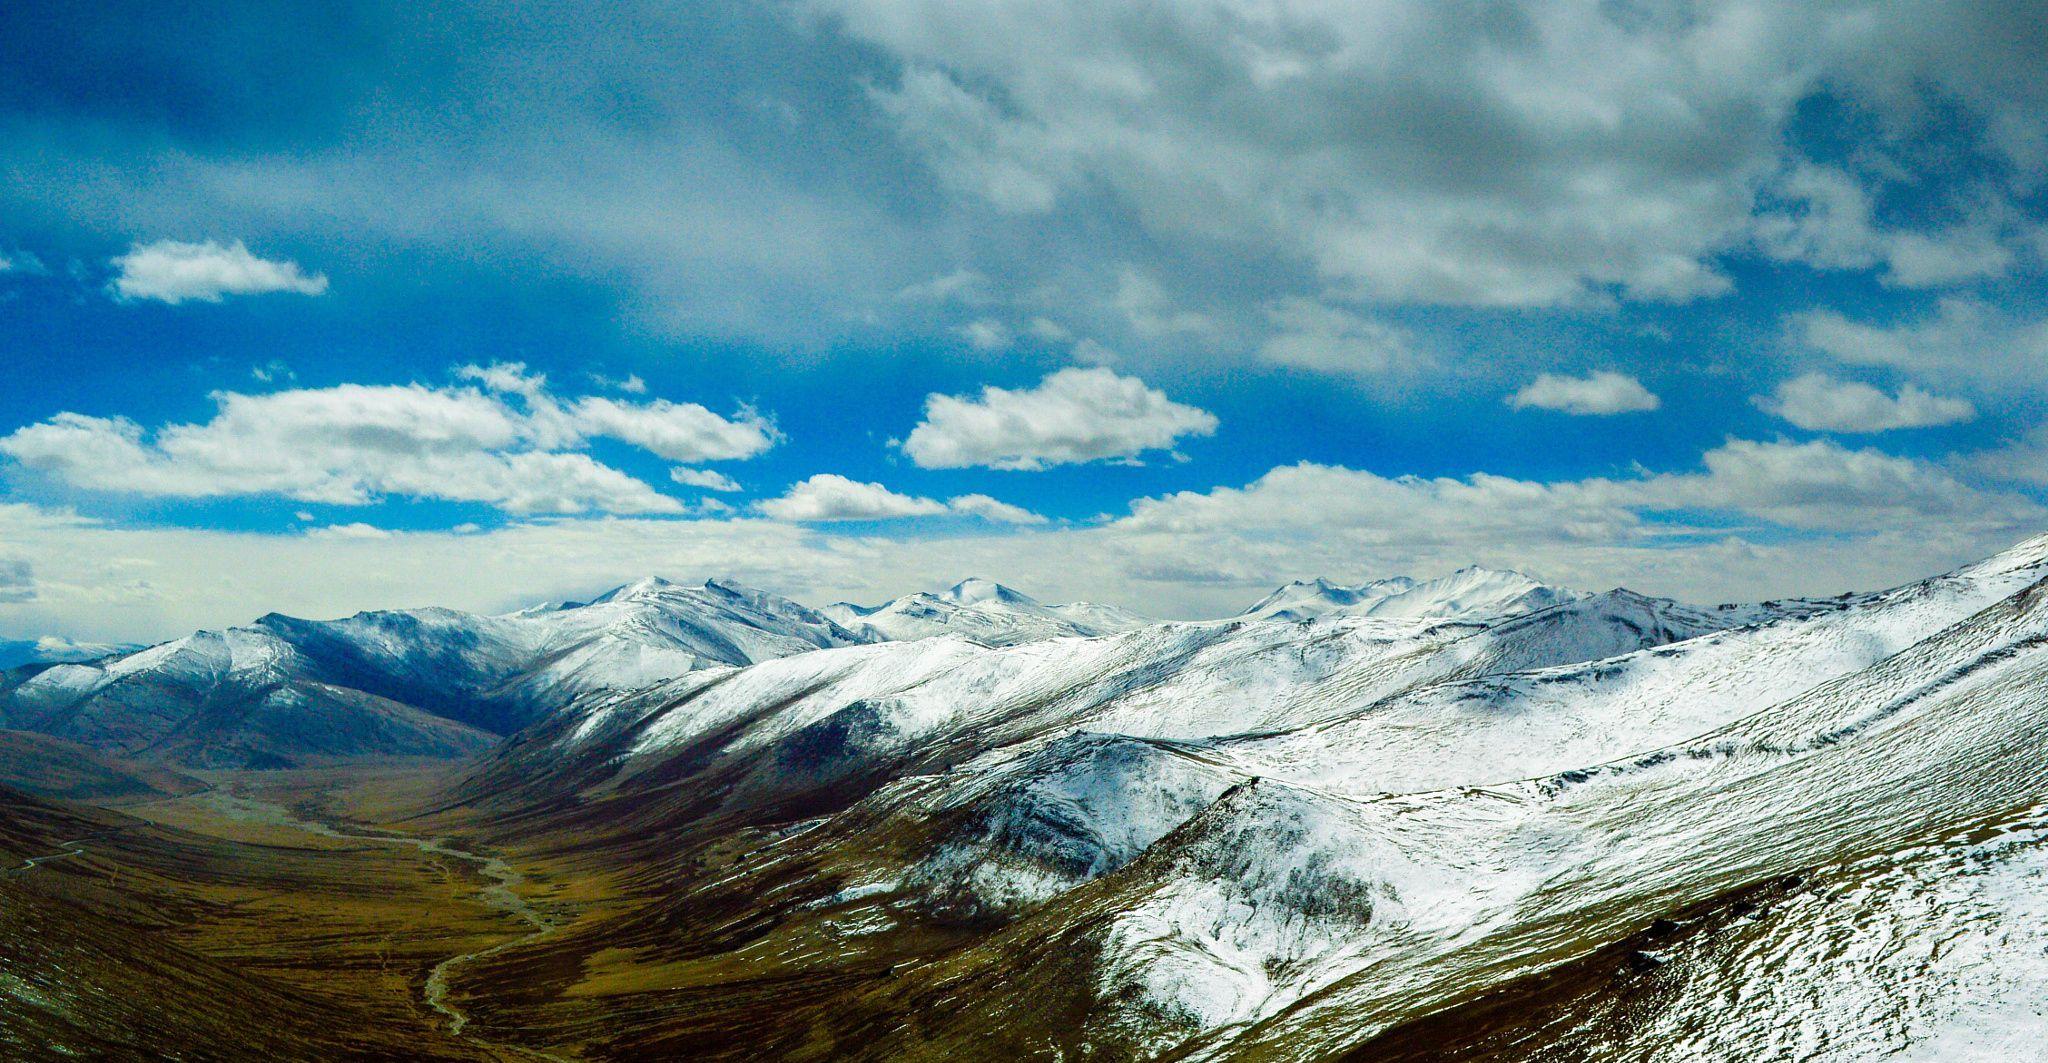 Baralacha La Pass, Ladakh